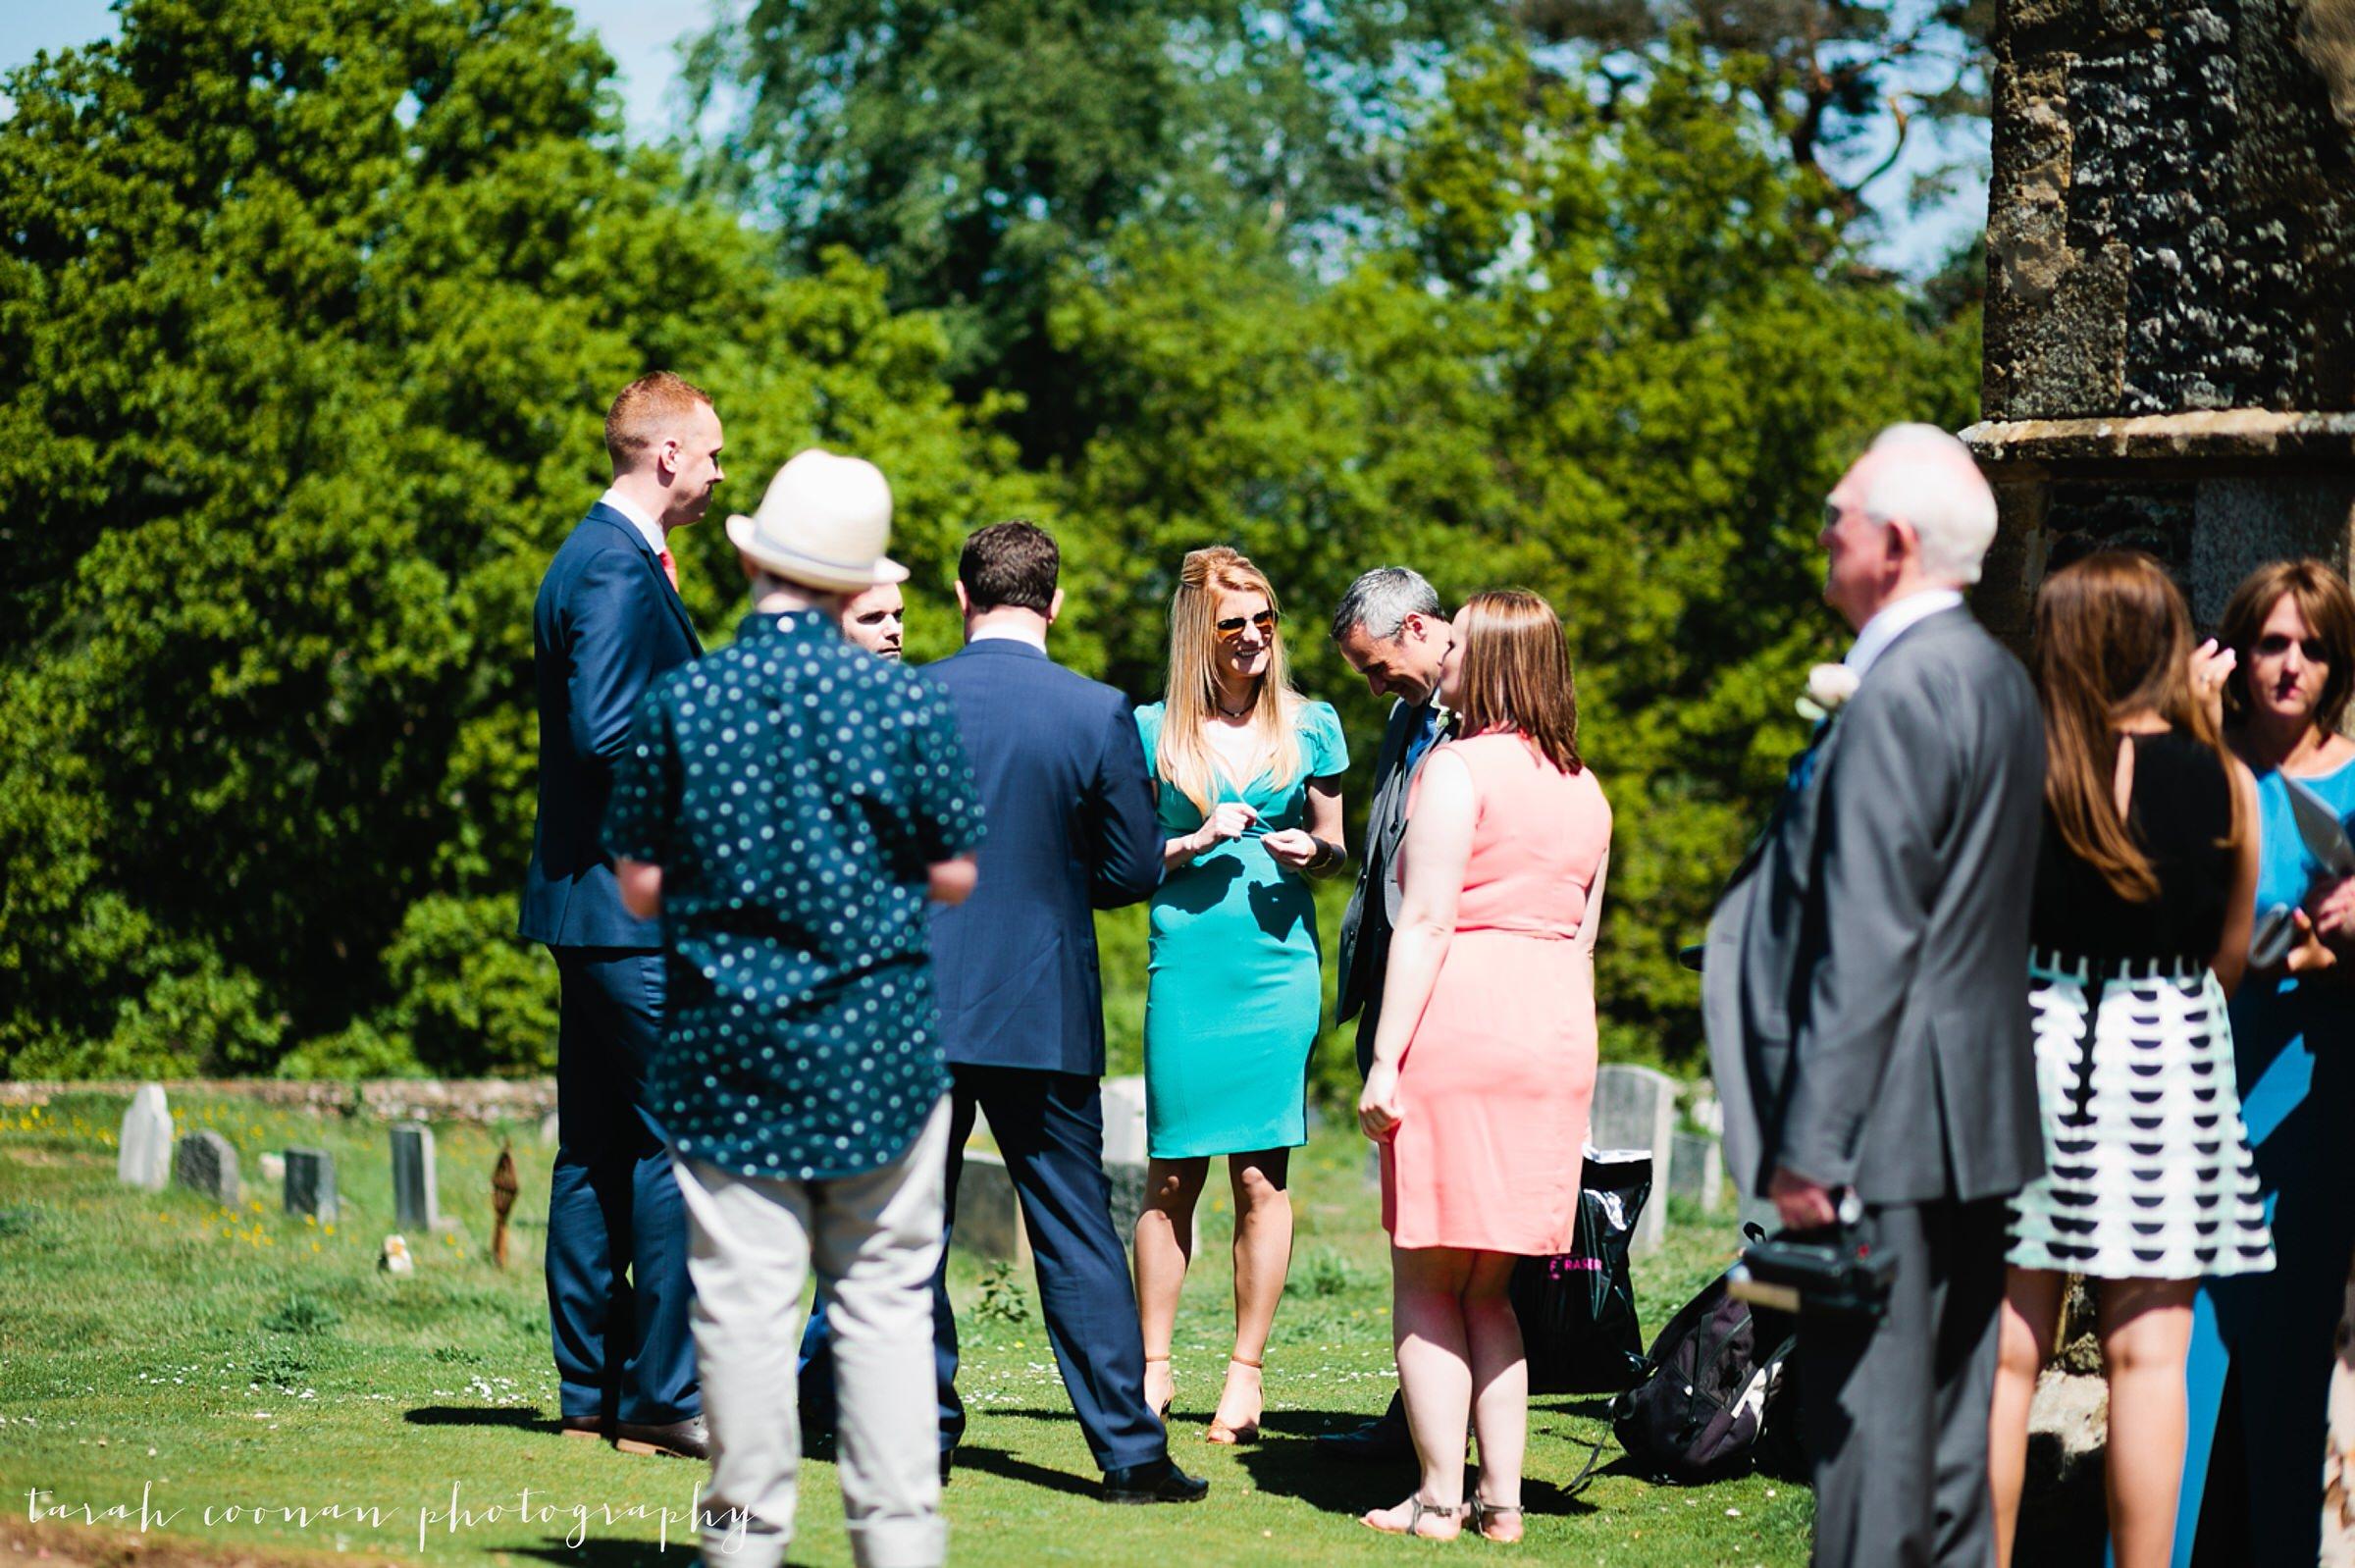 northbrook-park-wedding-photographer_043